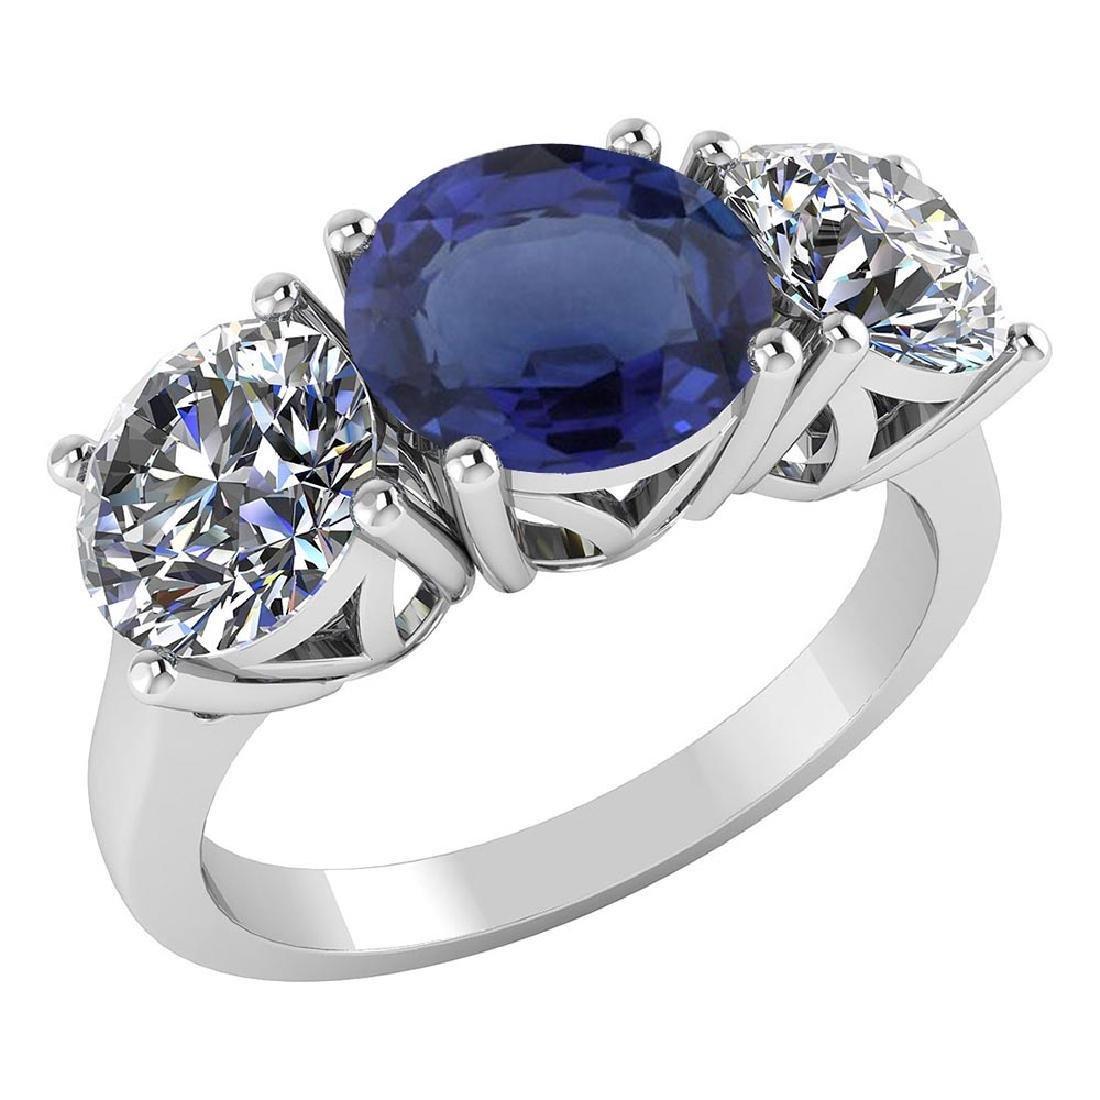 Certified 1.25 CTW Genuine Blue Sapphire And Diamond 14